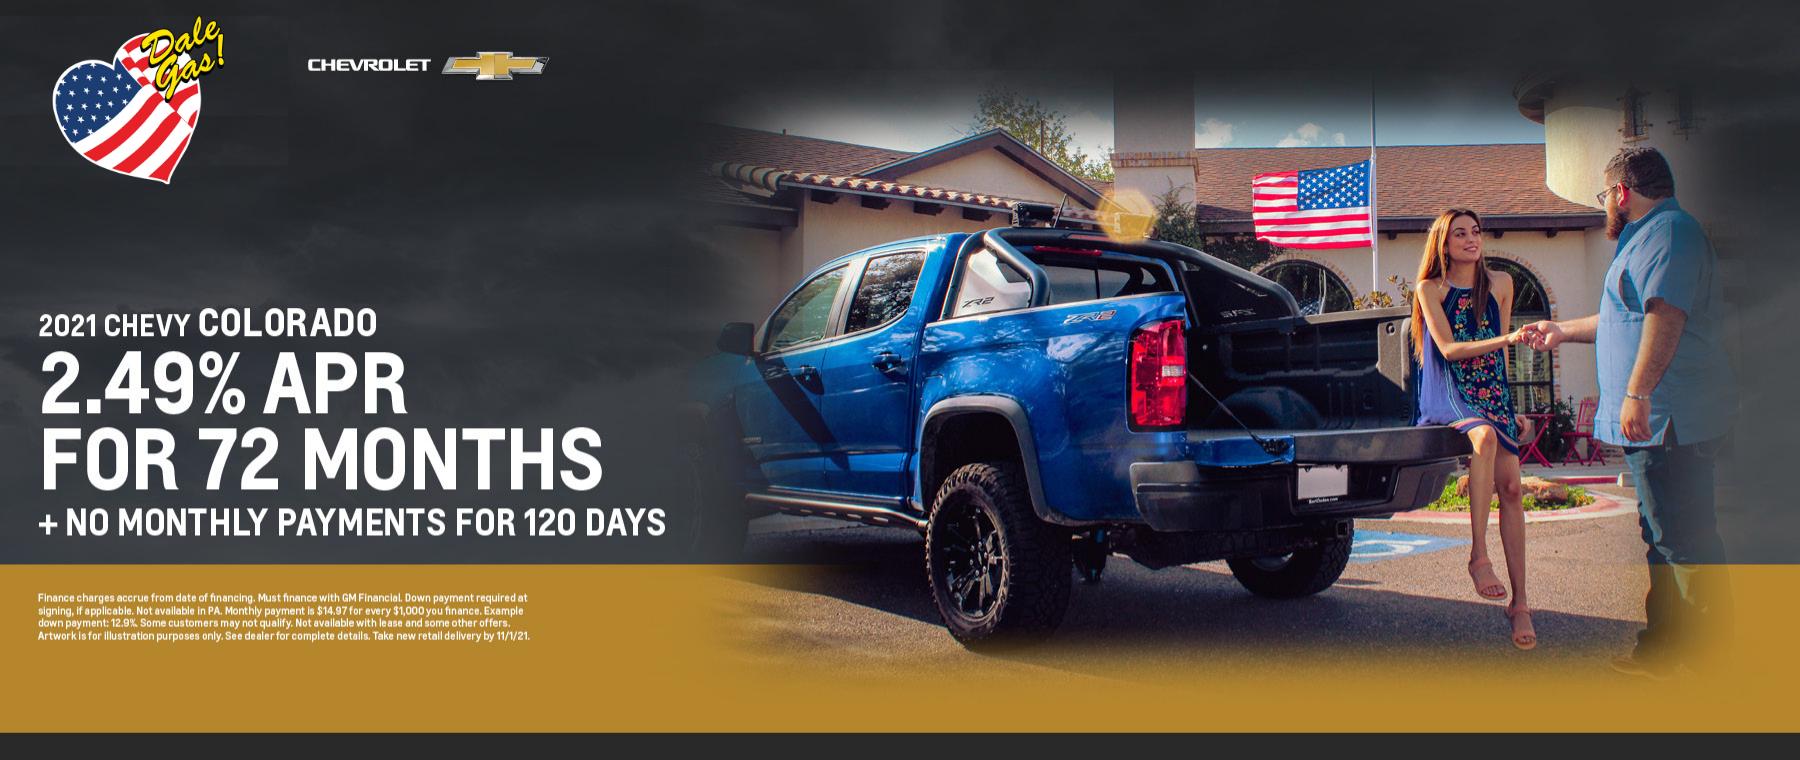 2021 Chevrolet Colorado Offer - October 2021